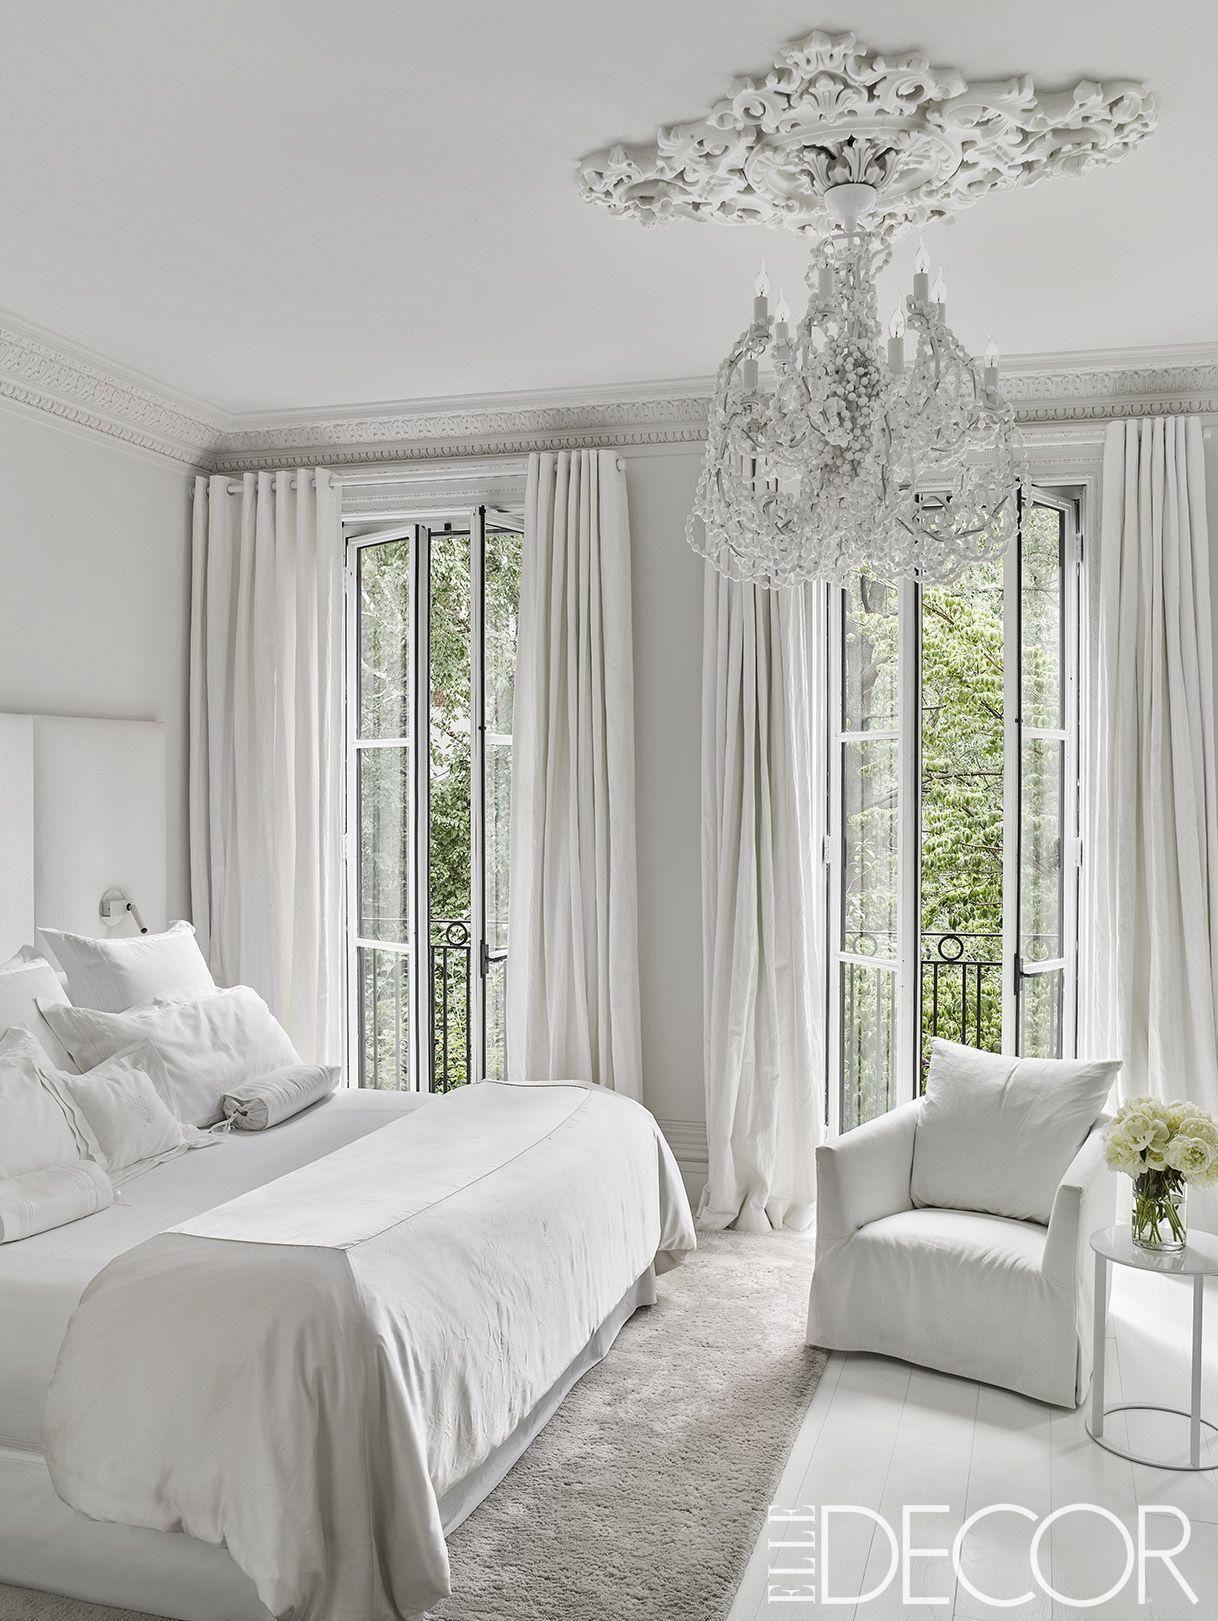 25 Minimalist Bedroom Decor Ideas - Modern Designs for ... on Minimalist Bedroom Design Ideas  id=56912